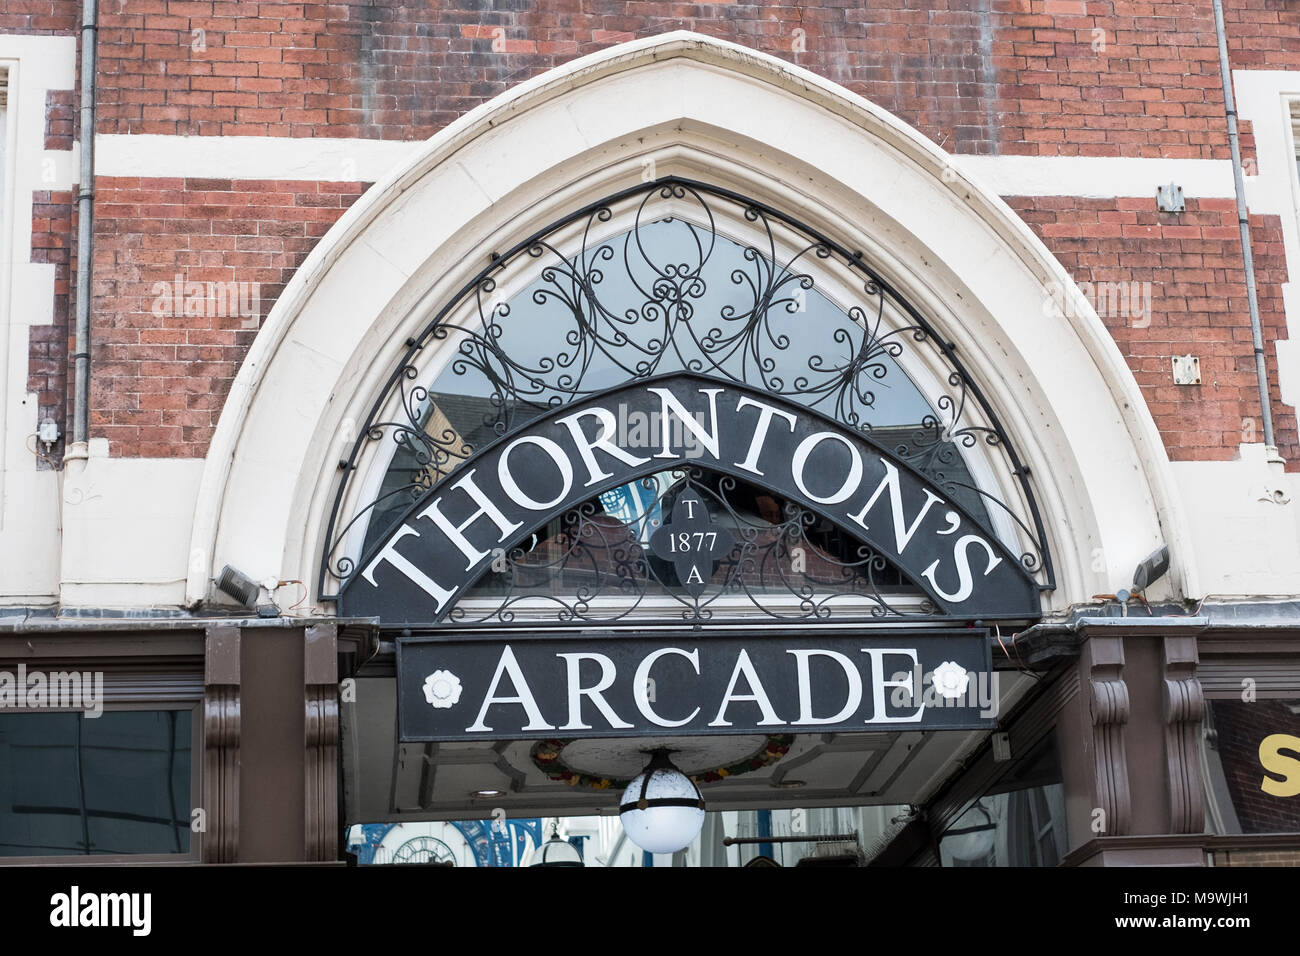 The entrance to Thorntons Arcade, Leeds, West Yorkshire, UK - Stock Image